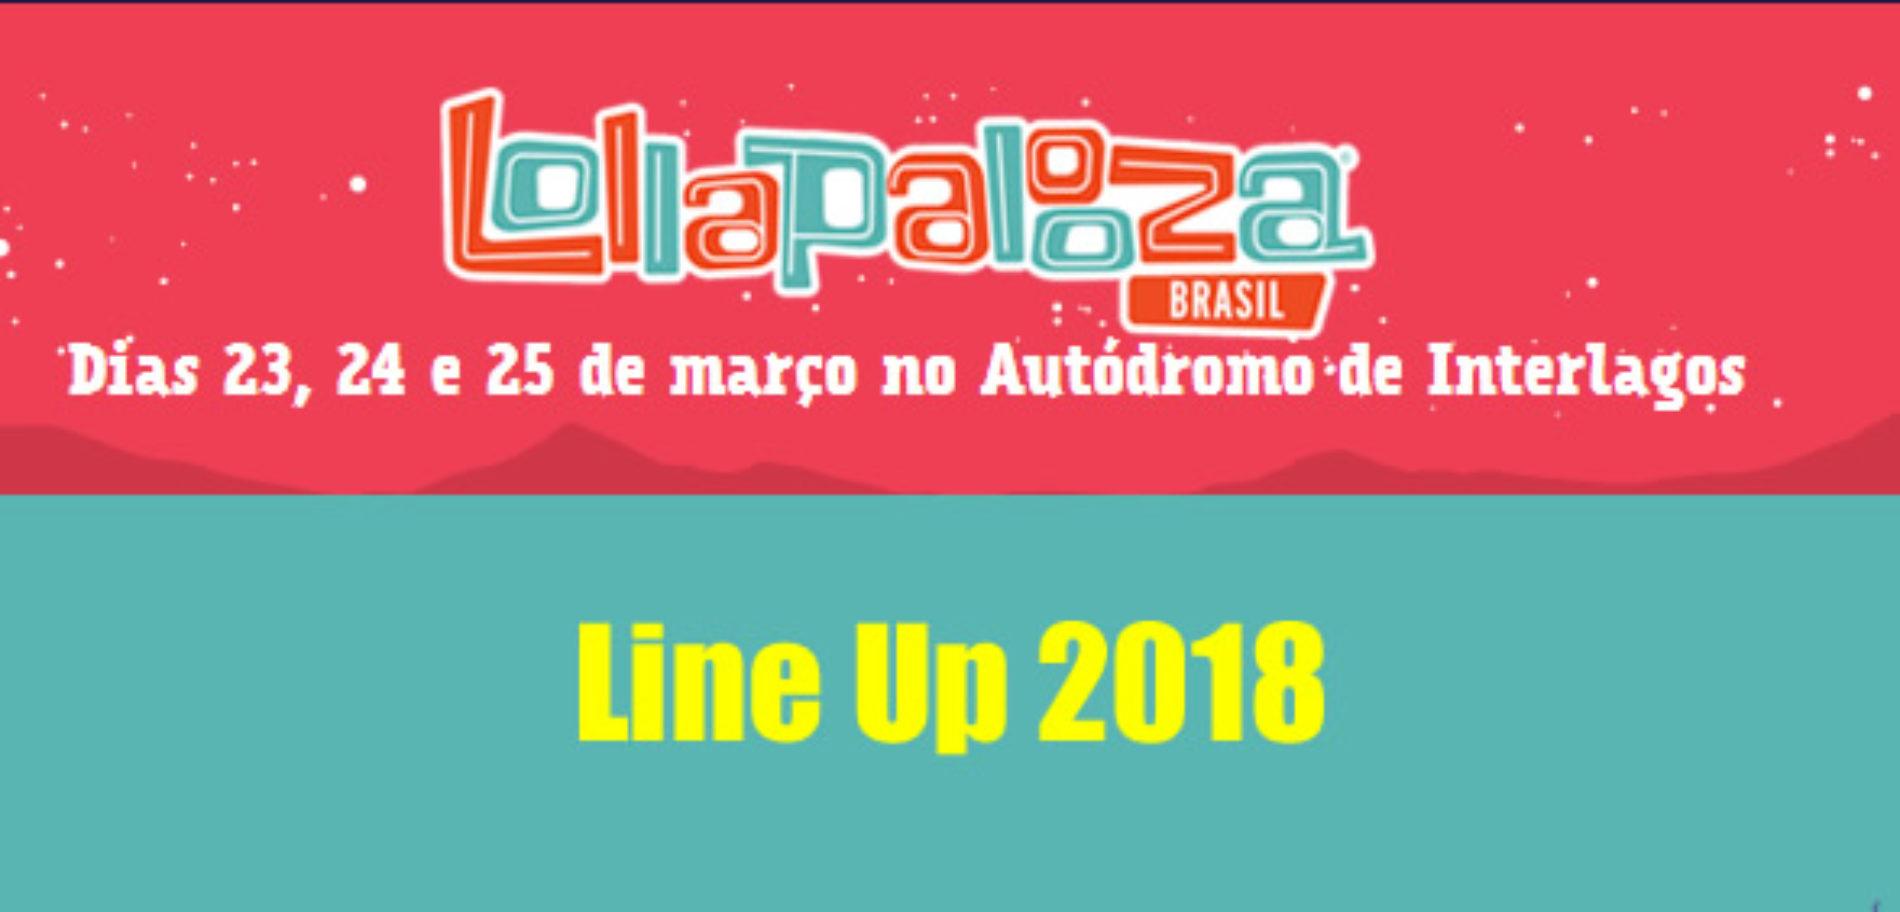 LineUp Programação Lolla BR 2018 | Lollapalooza